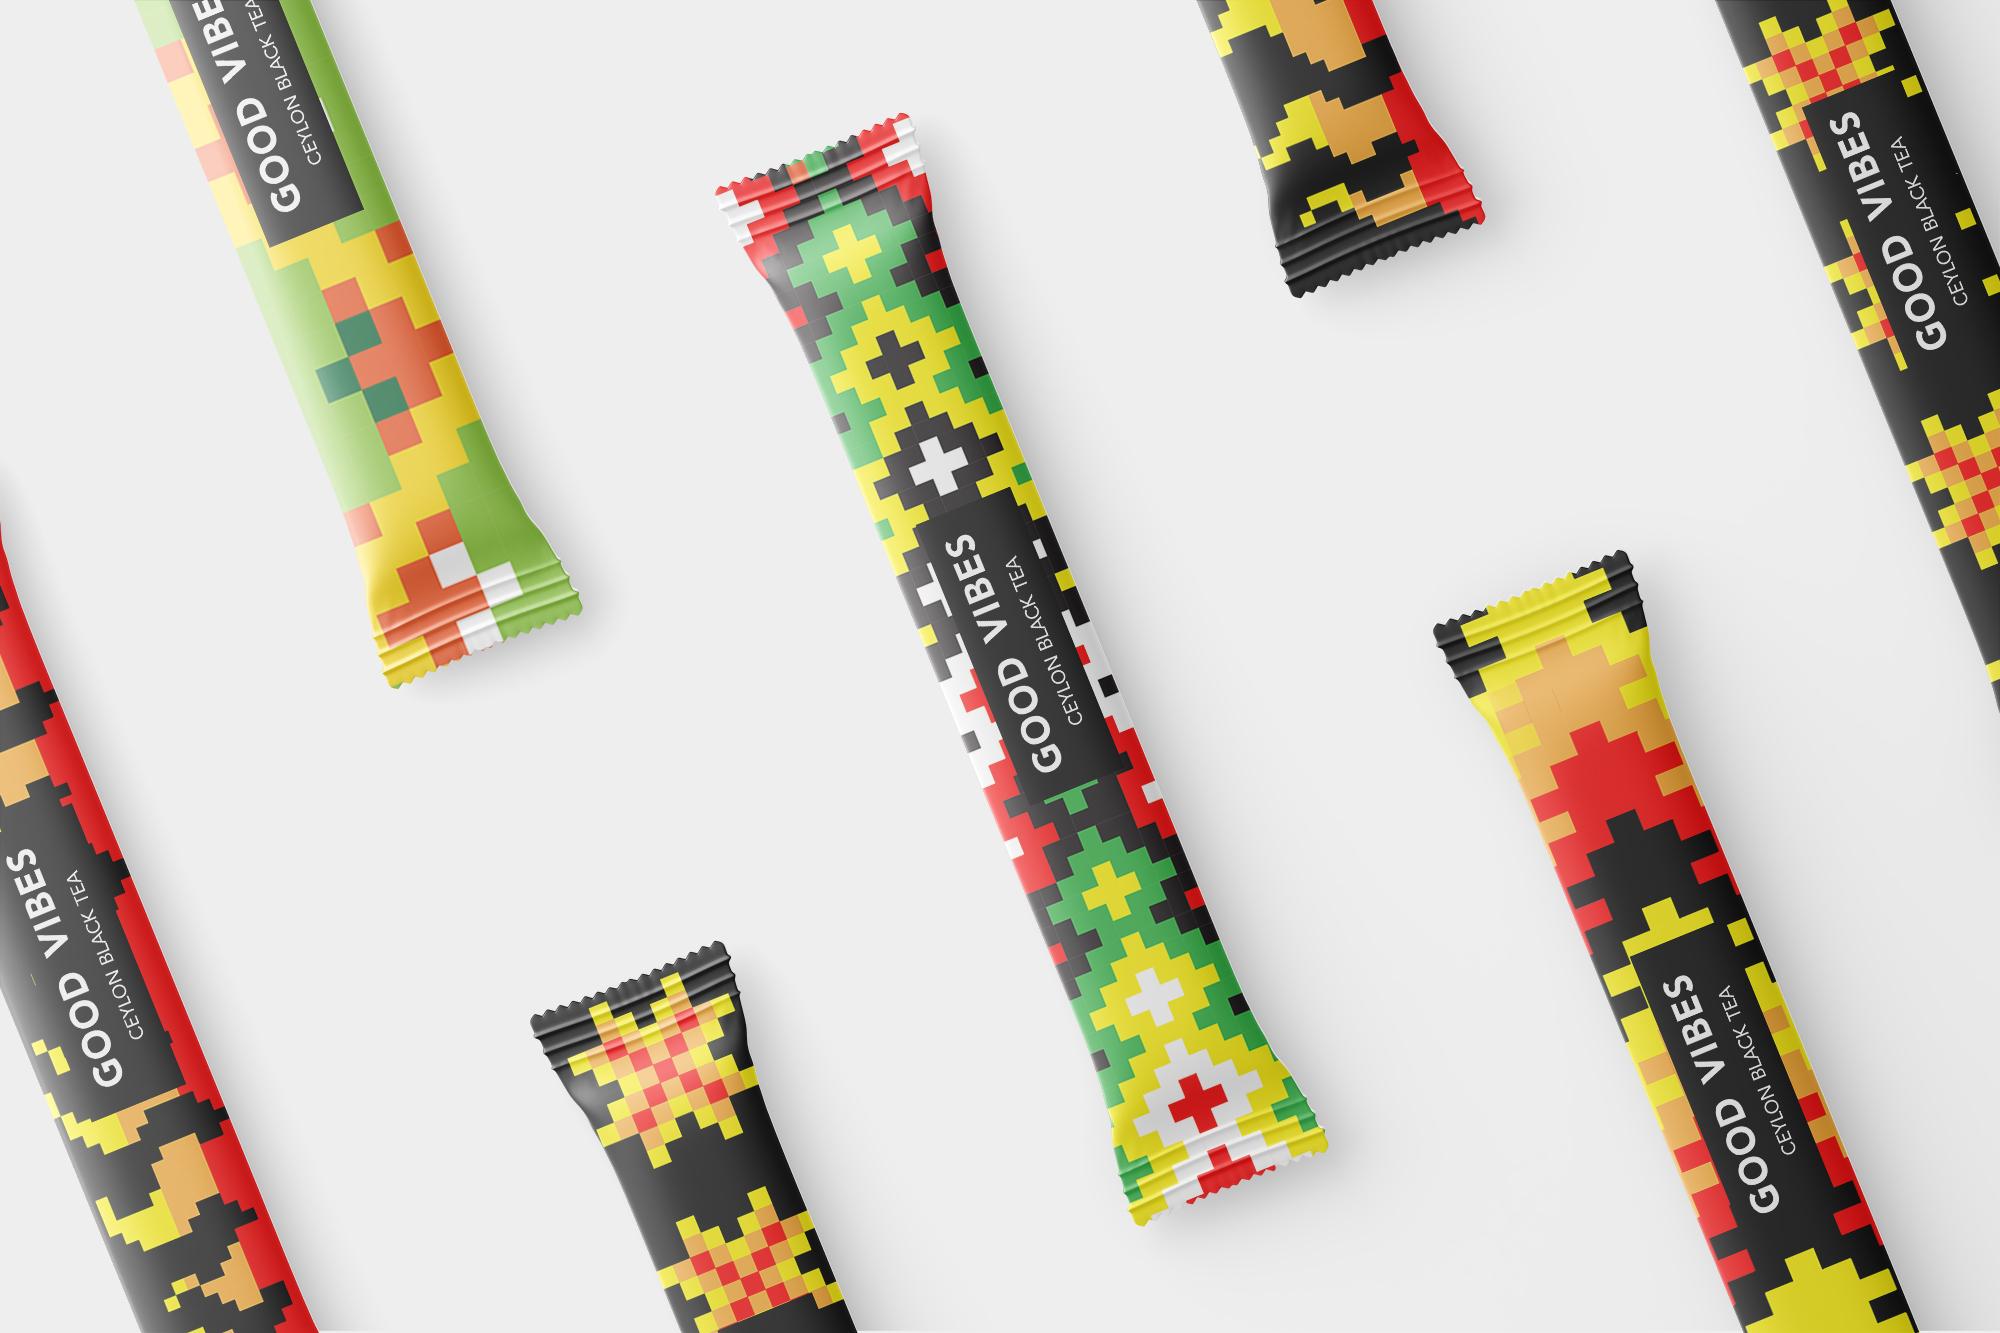 Ceylon Black Tea Good Vibes Student Packaging Design Concept by Ekaterina Nikolaeva